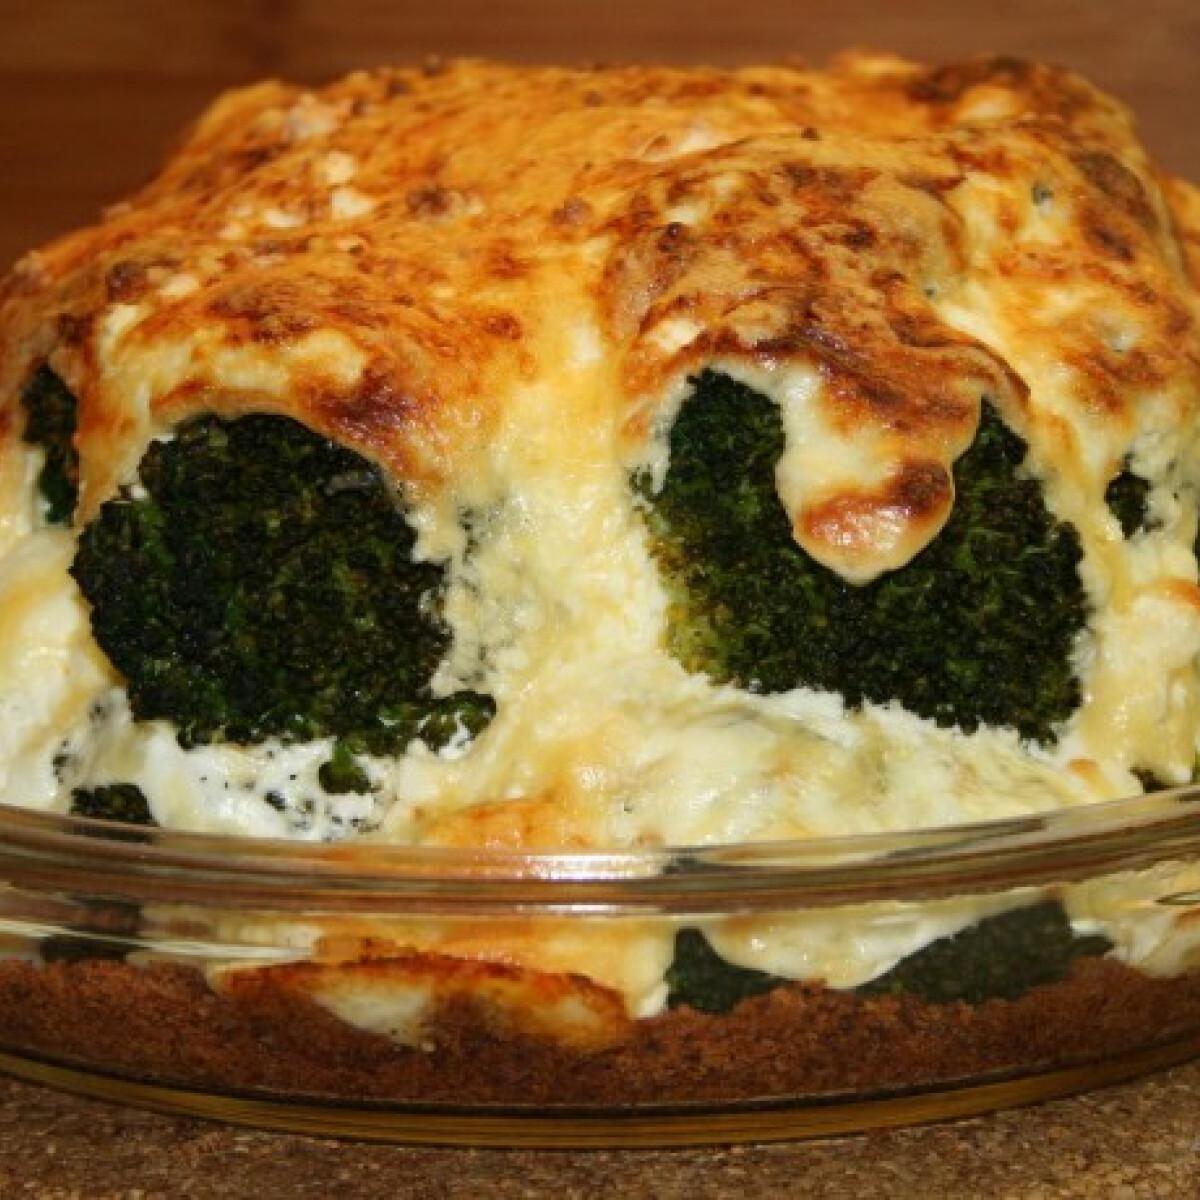 Brokkoli sajtkabátban csőben sütve